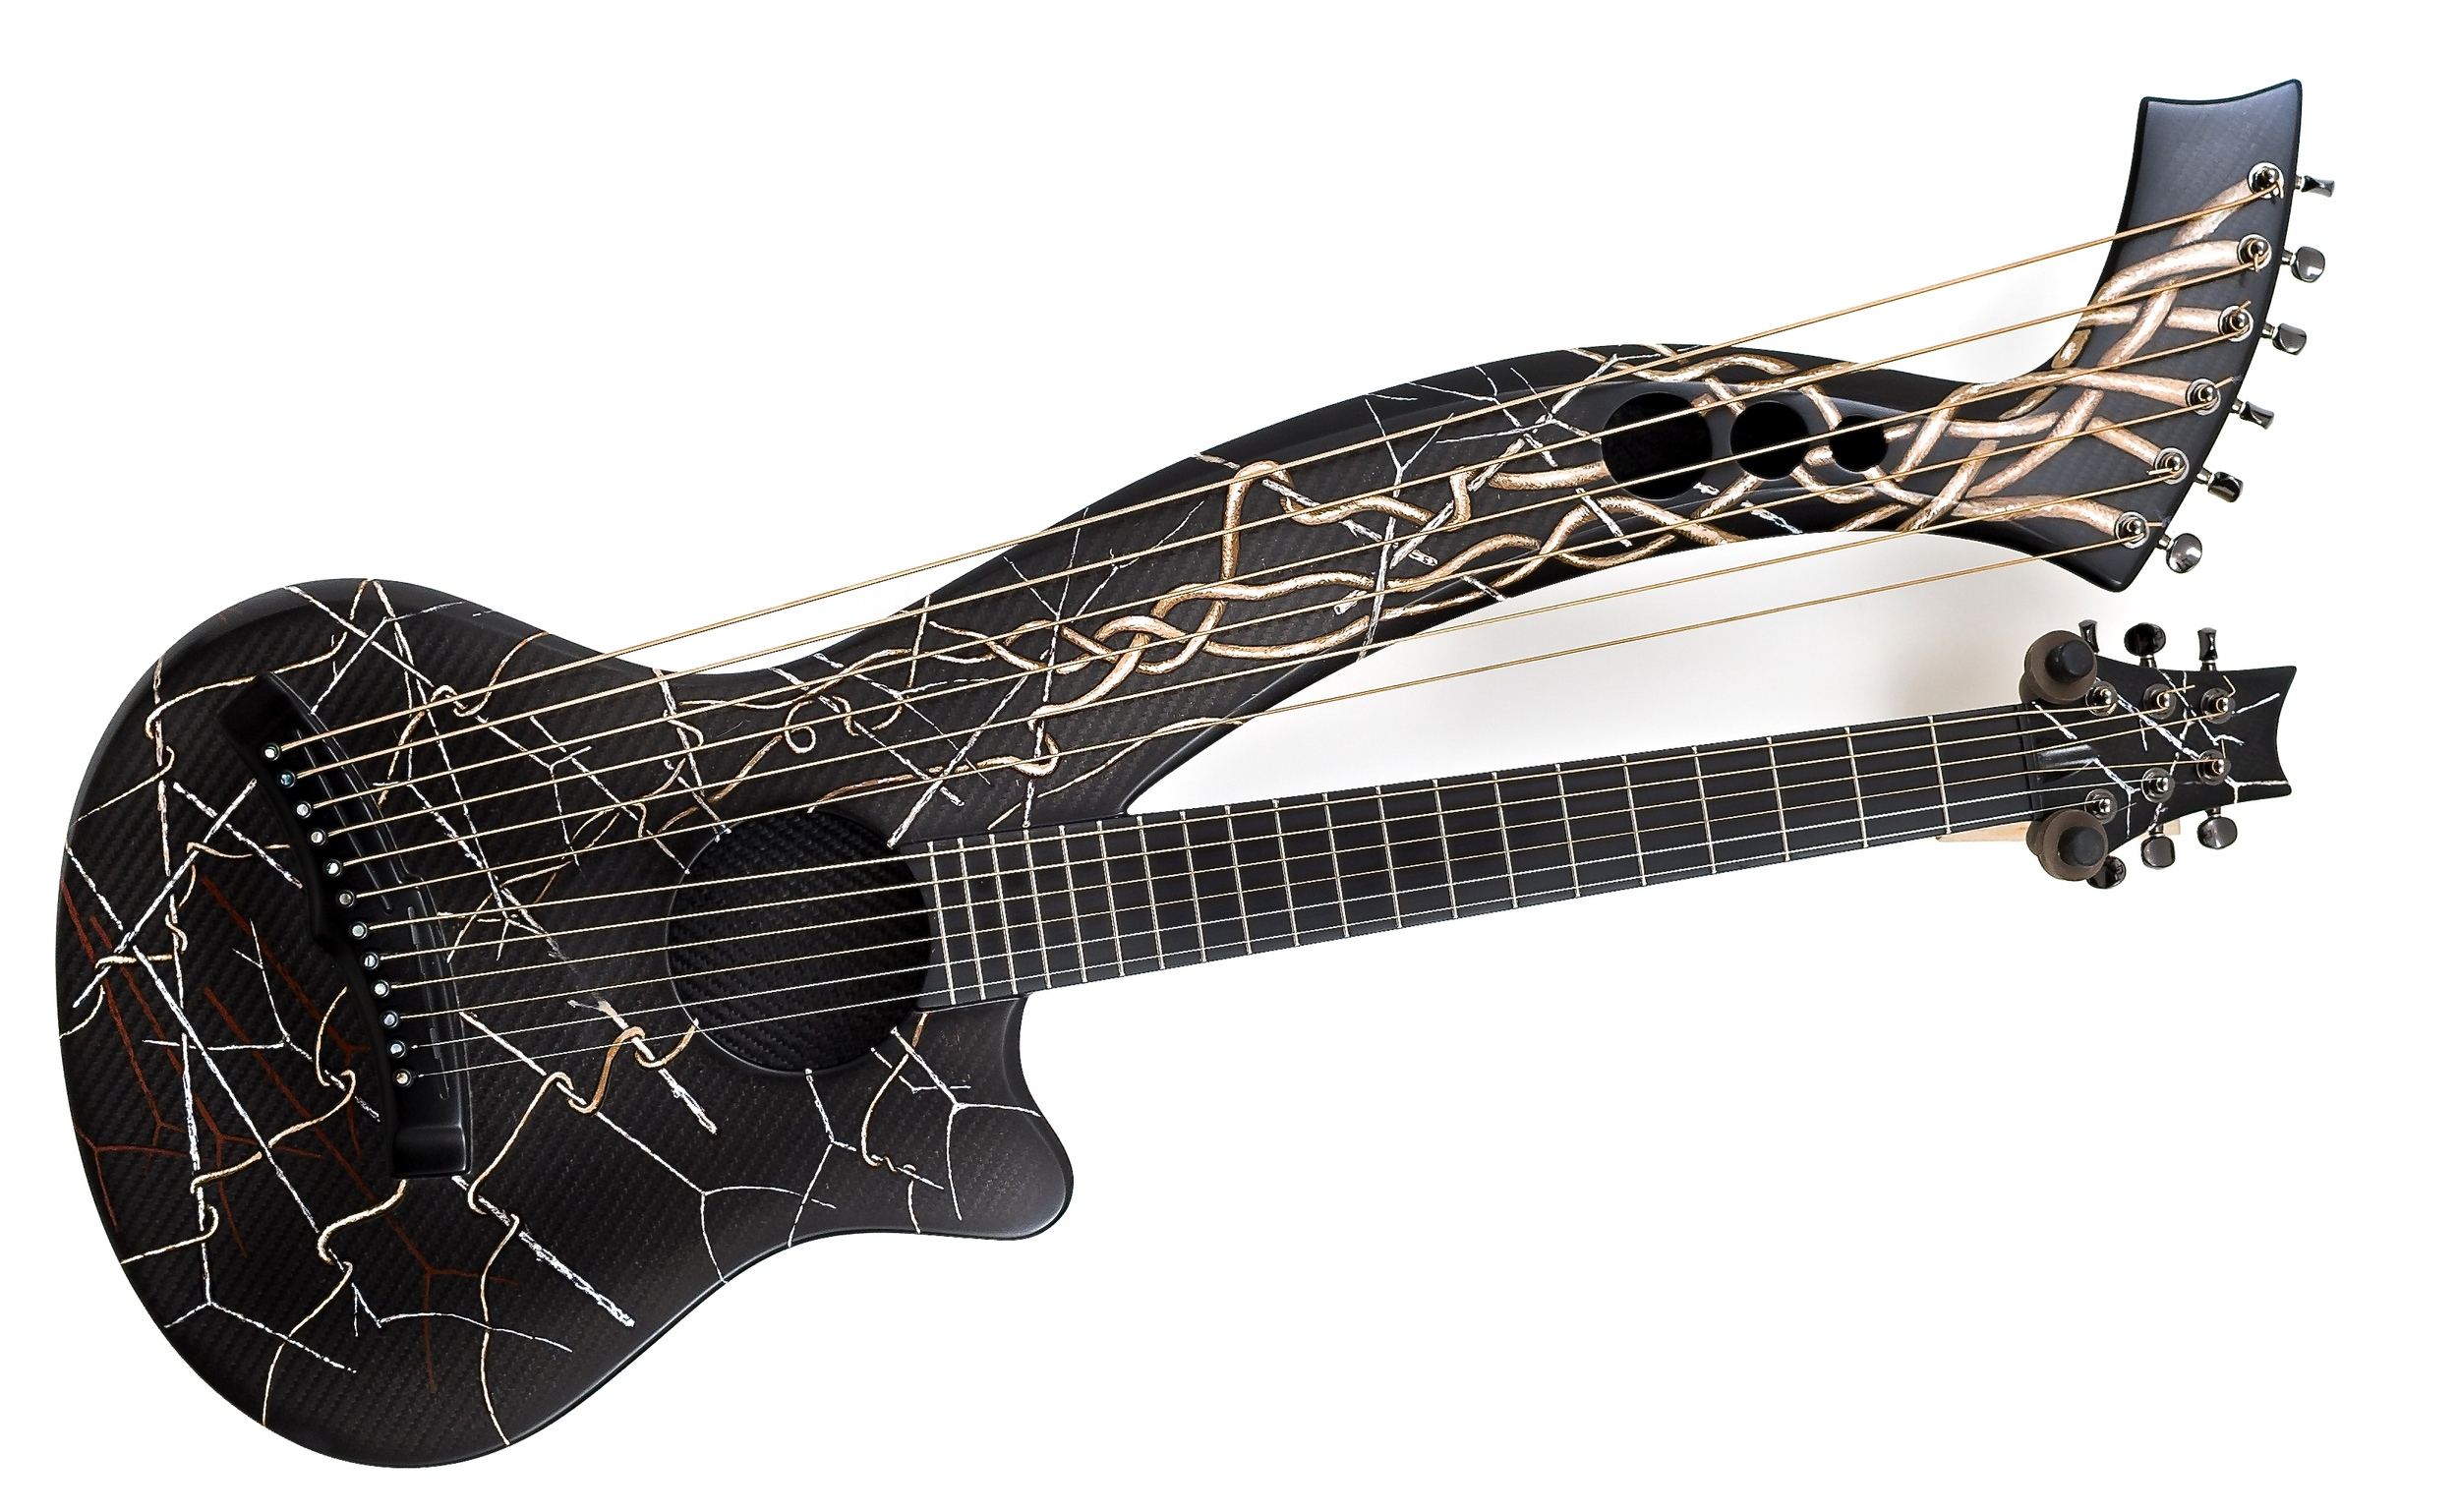 """Vines and Zen Sticks"" Artists pigment in shellac on carbon fiber harp guitar by Emerald guitars of Ireland. contact Emerald guitars of Ireland  #emeraldguitars #artoftheacousticfinish"